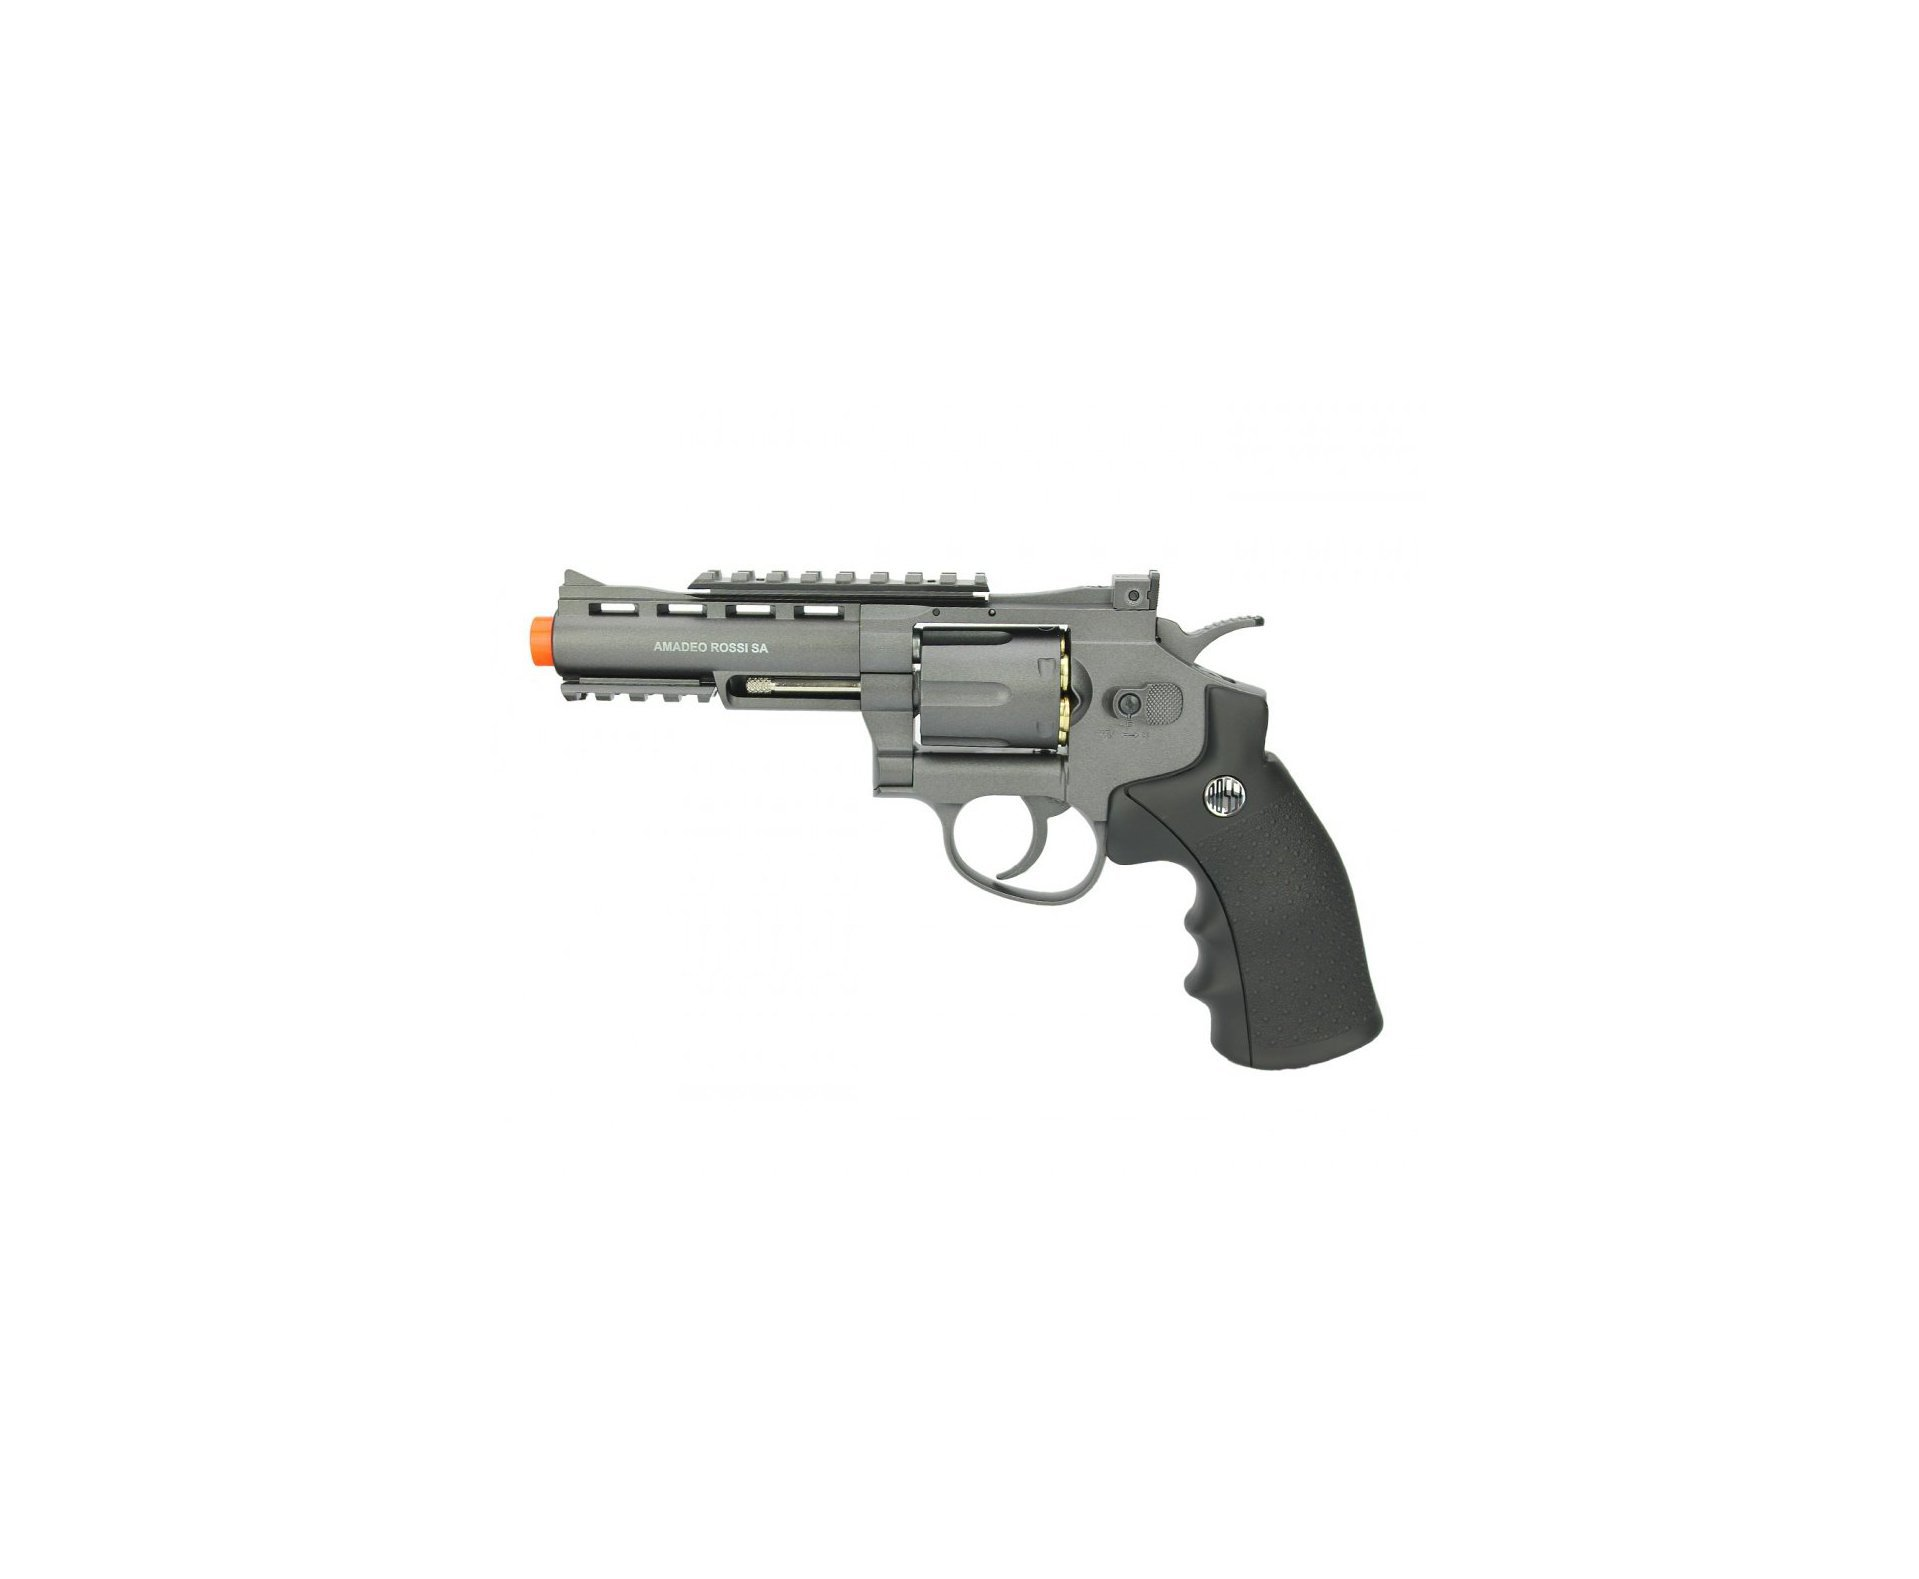 "Revolver 38 Airsoft Gas Co2 6 Tiros 4"" Ox Rossi Full Metal M701 6.0mm Wingun + 02 Co2 + Esferas"